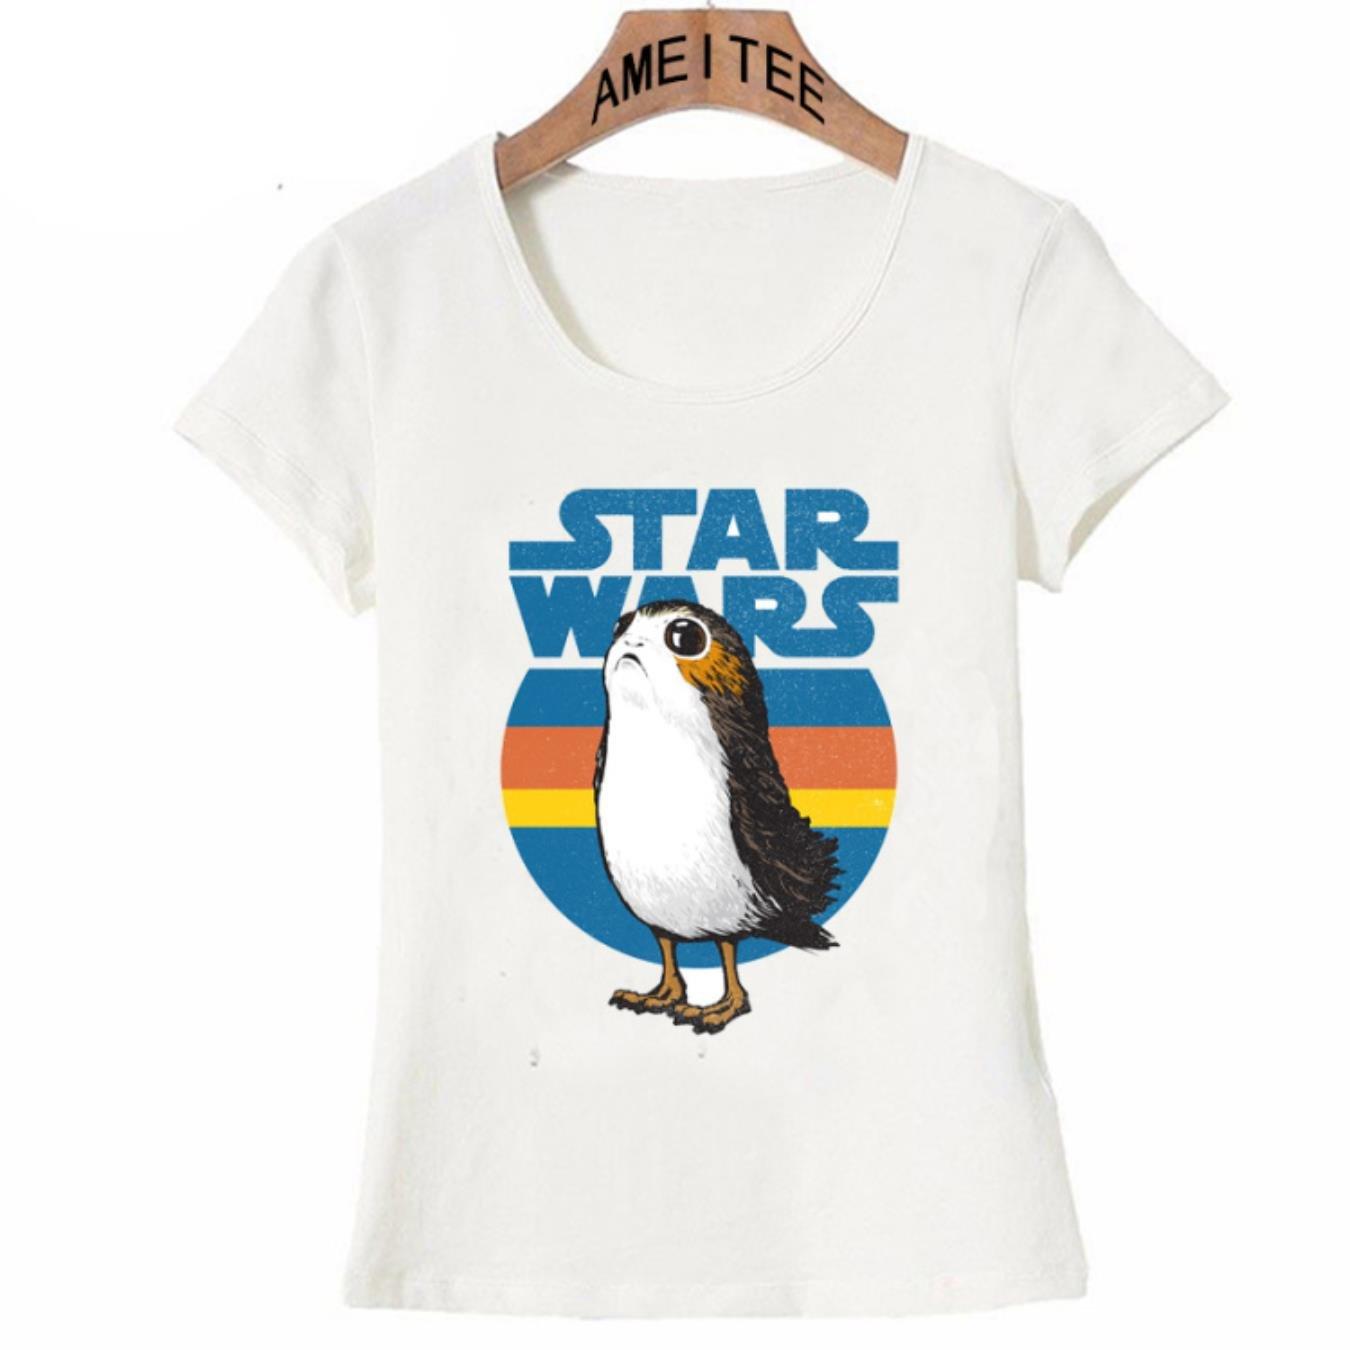 Vintage street girl T-Shirt Summer cute women t-shirt Star Wars Porg printing ladies Tops